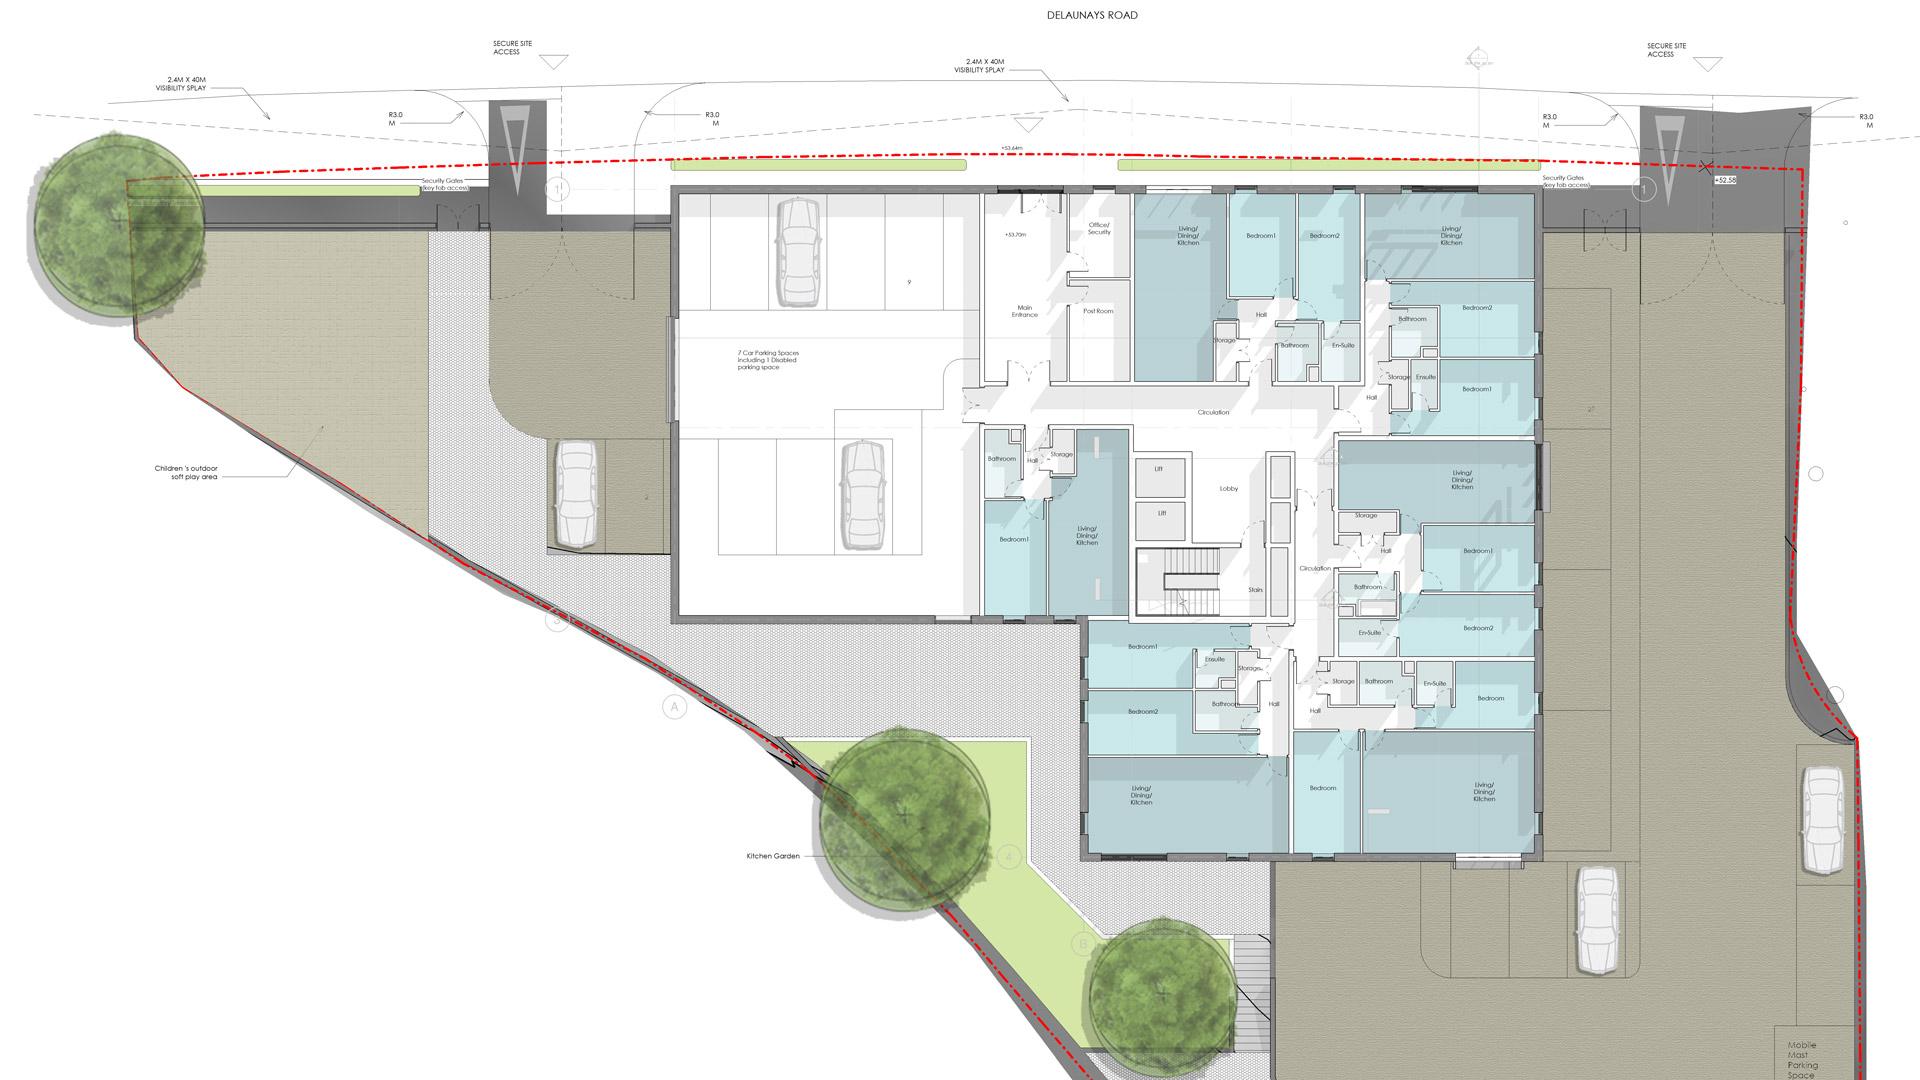 StudioTashkeel_Imperial_House_Apartments_3